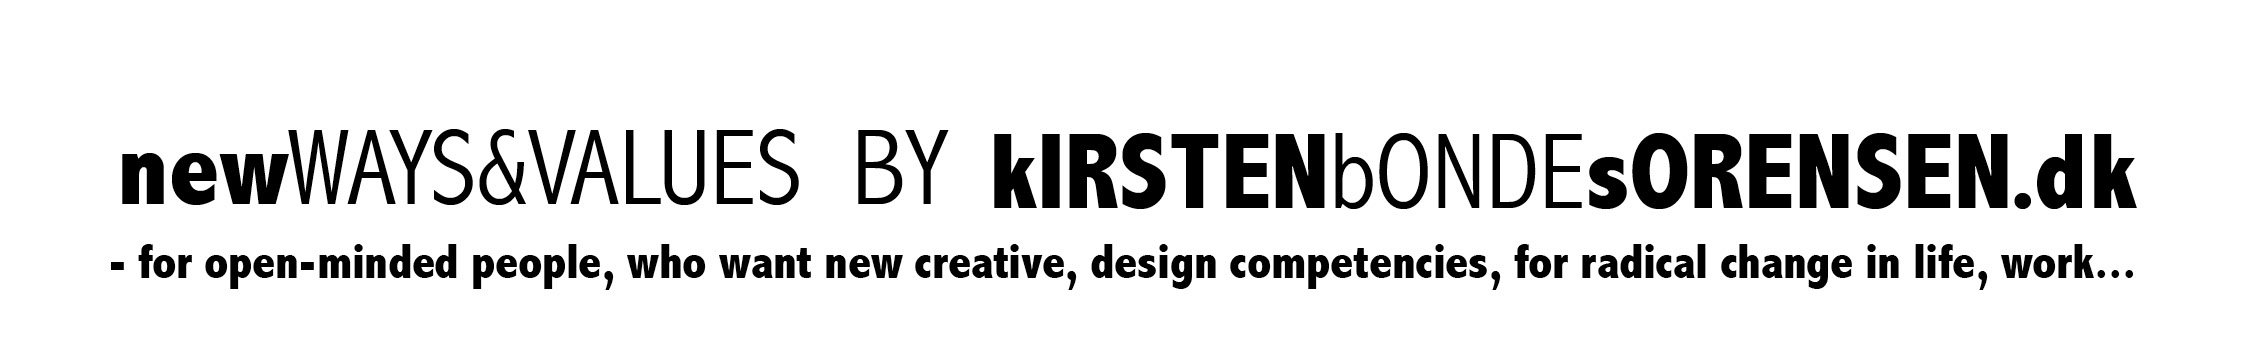 Kirsten Bonde Sørensen